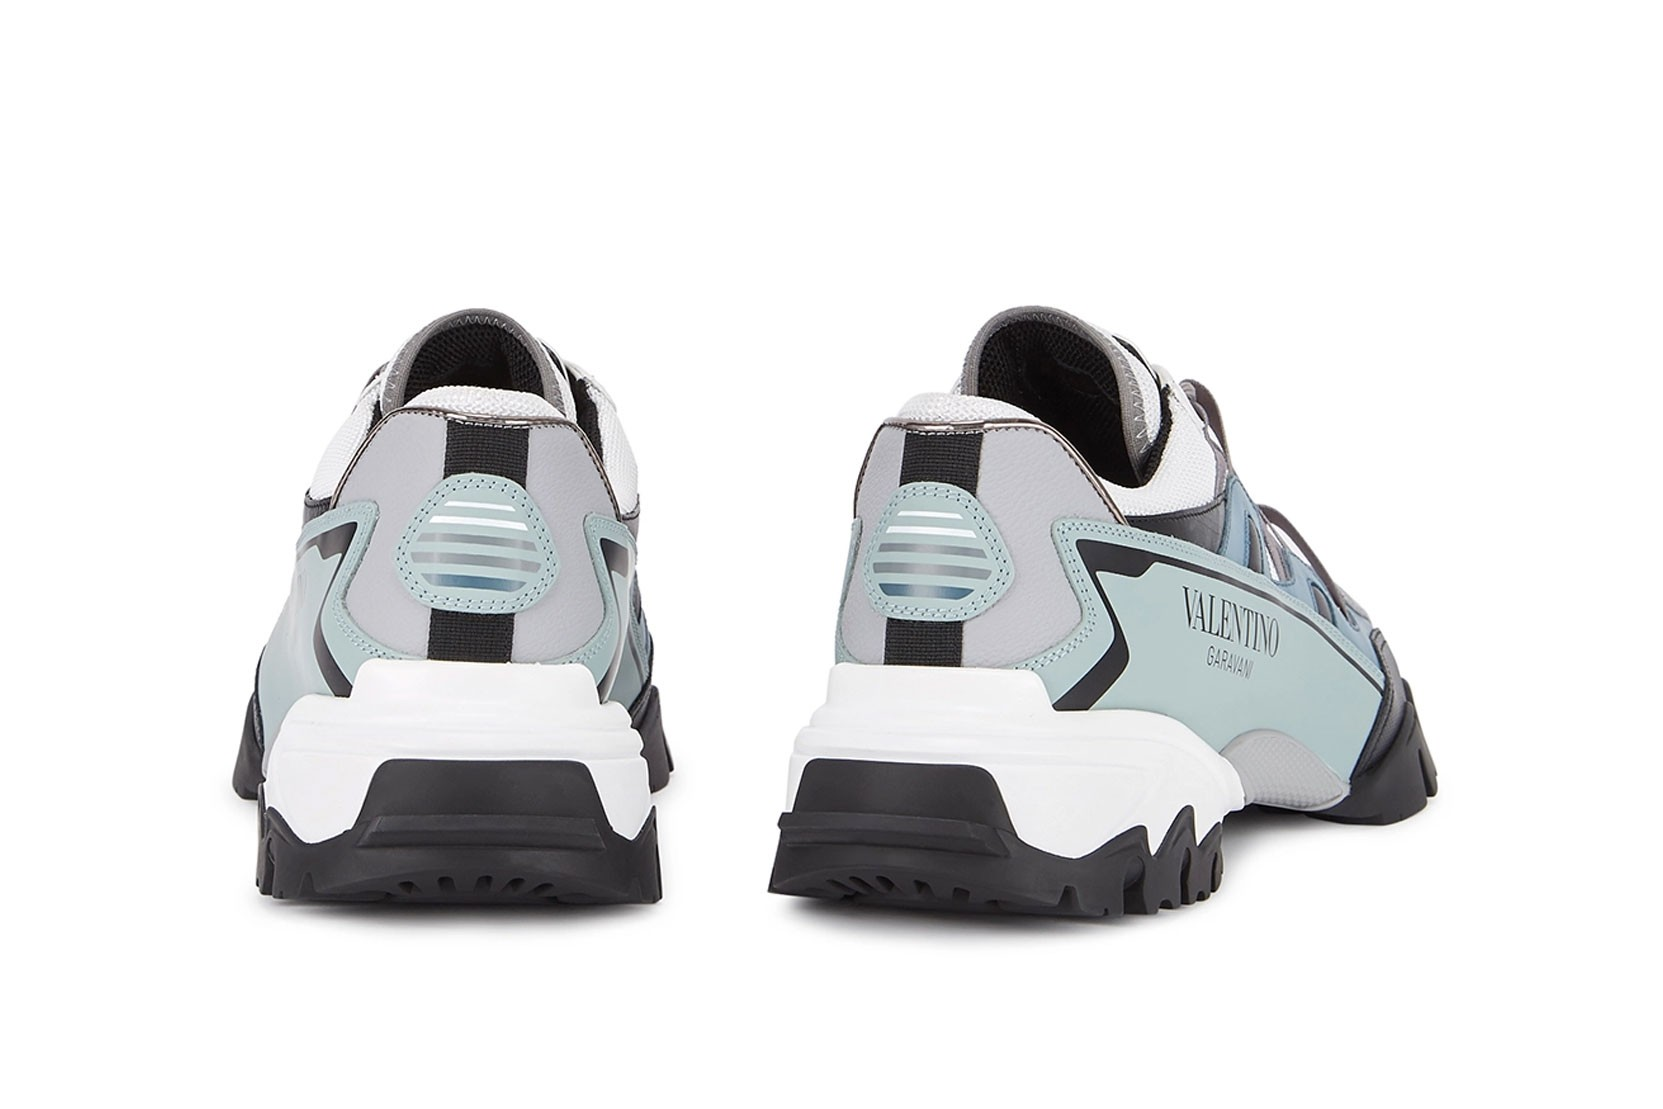 Valentino Garavani Climbers Sneakers in